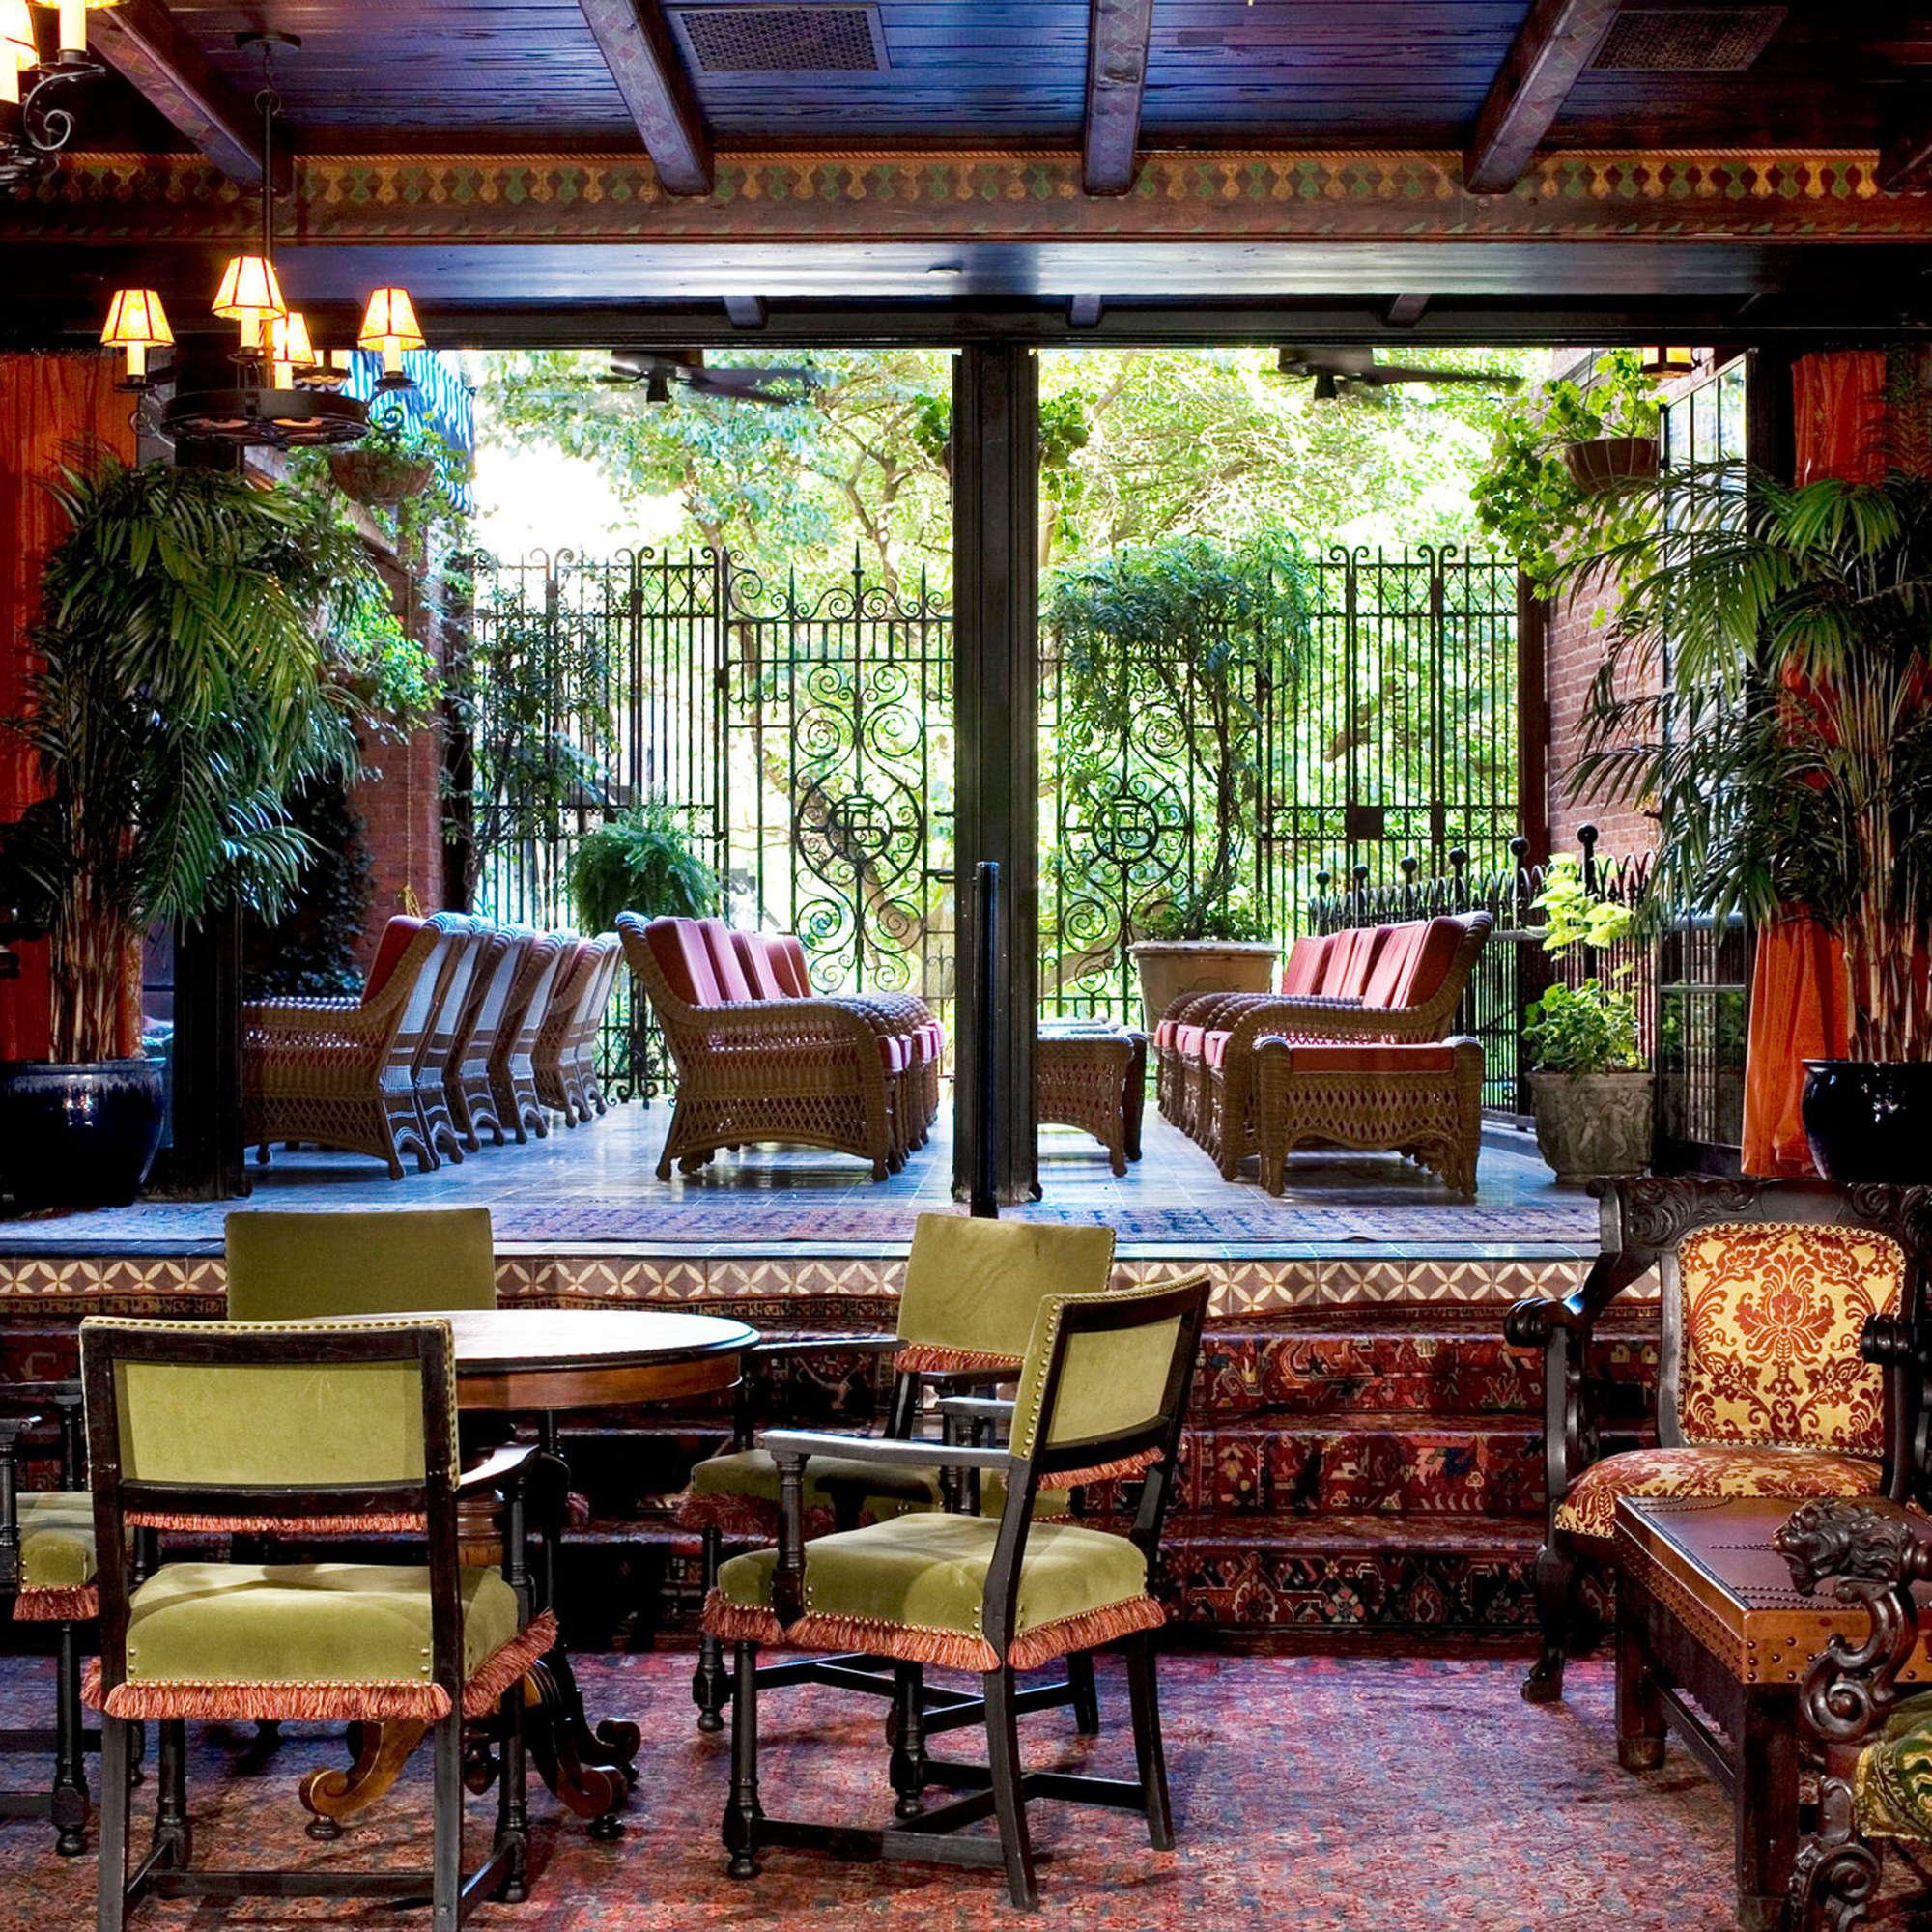 The Bowery Hotel, New York forecasting